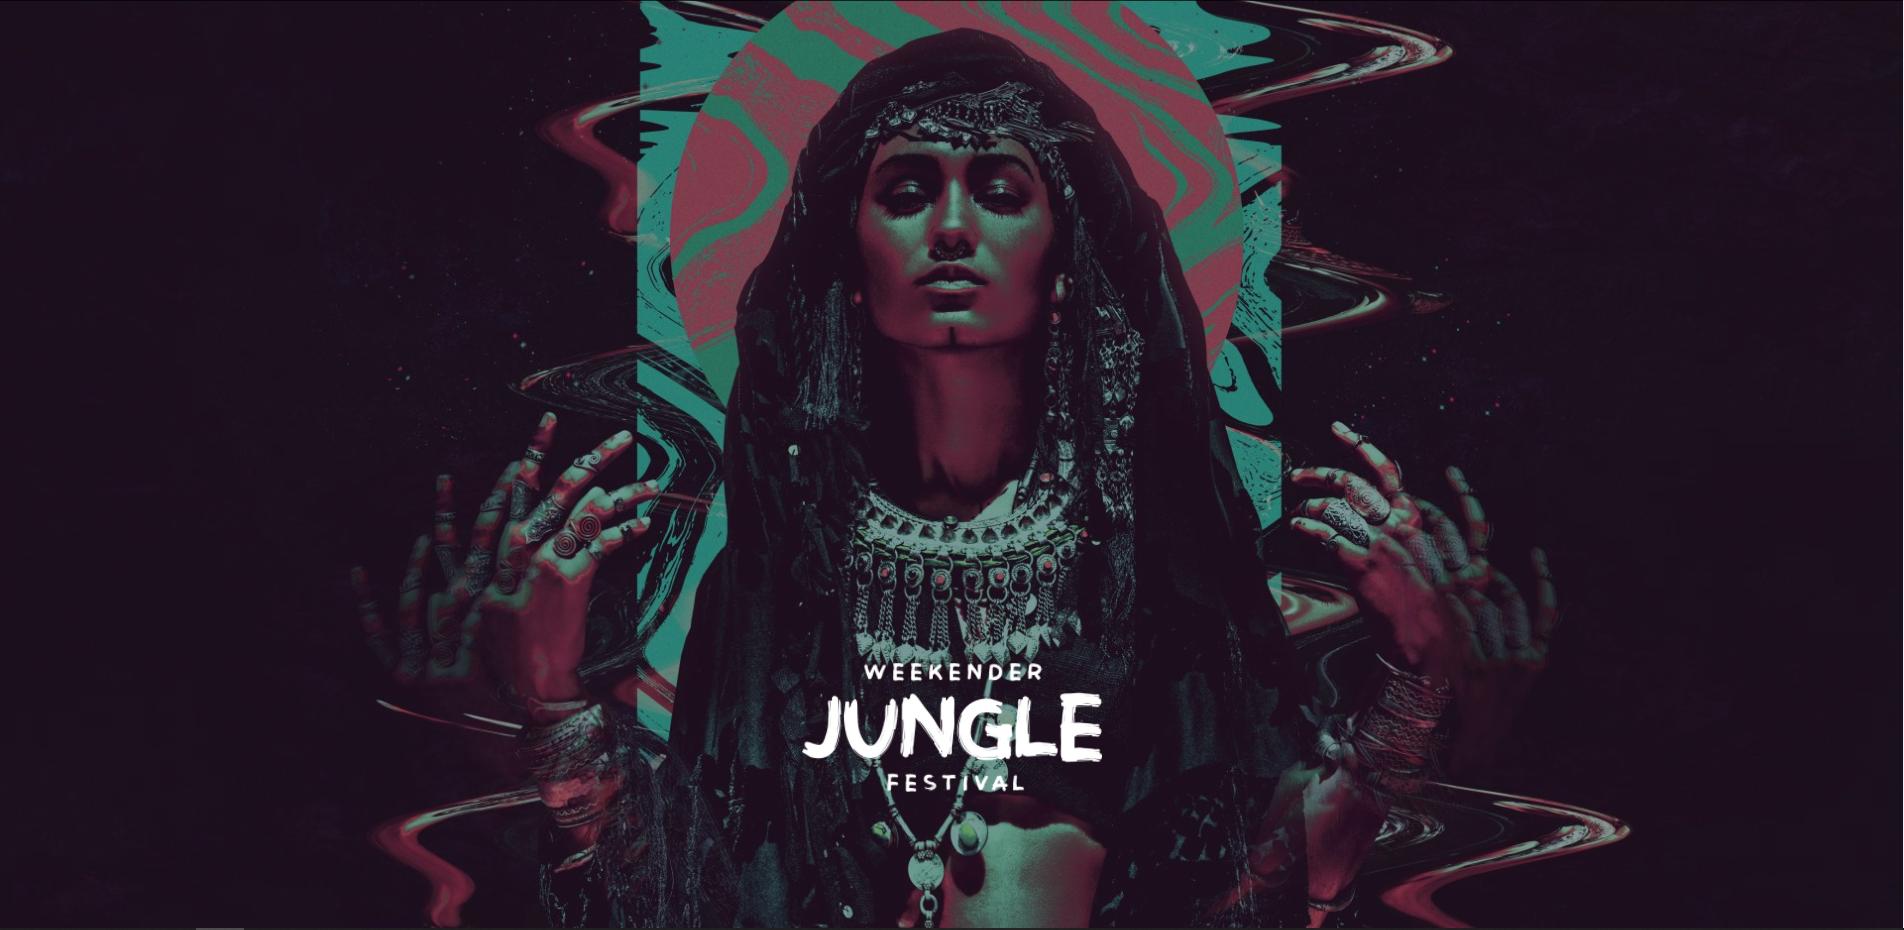 Jungle weekender festival